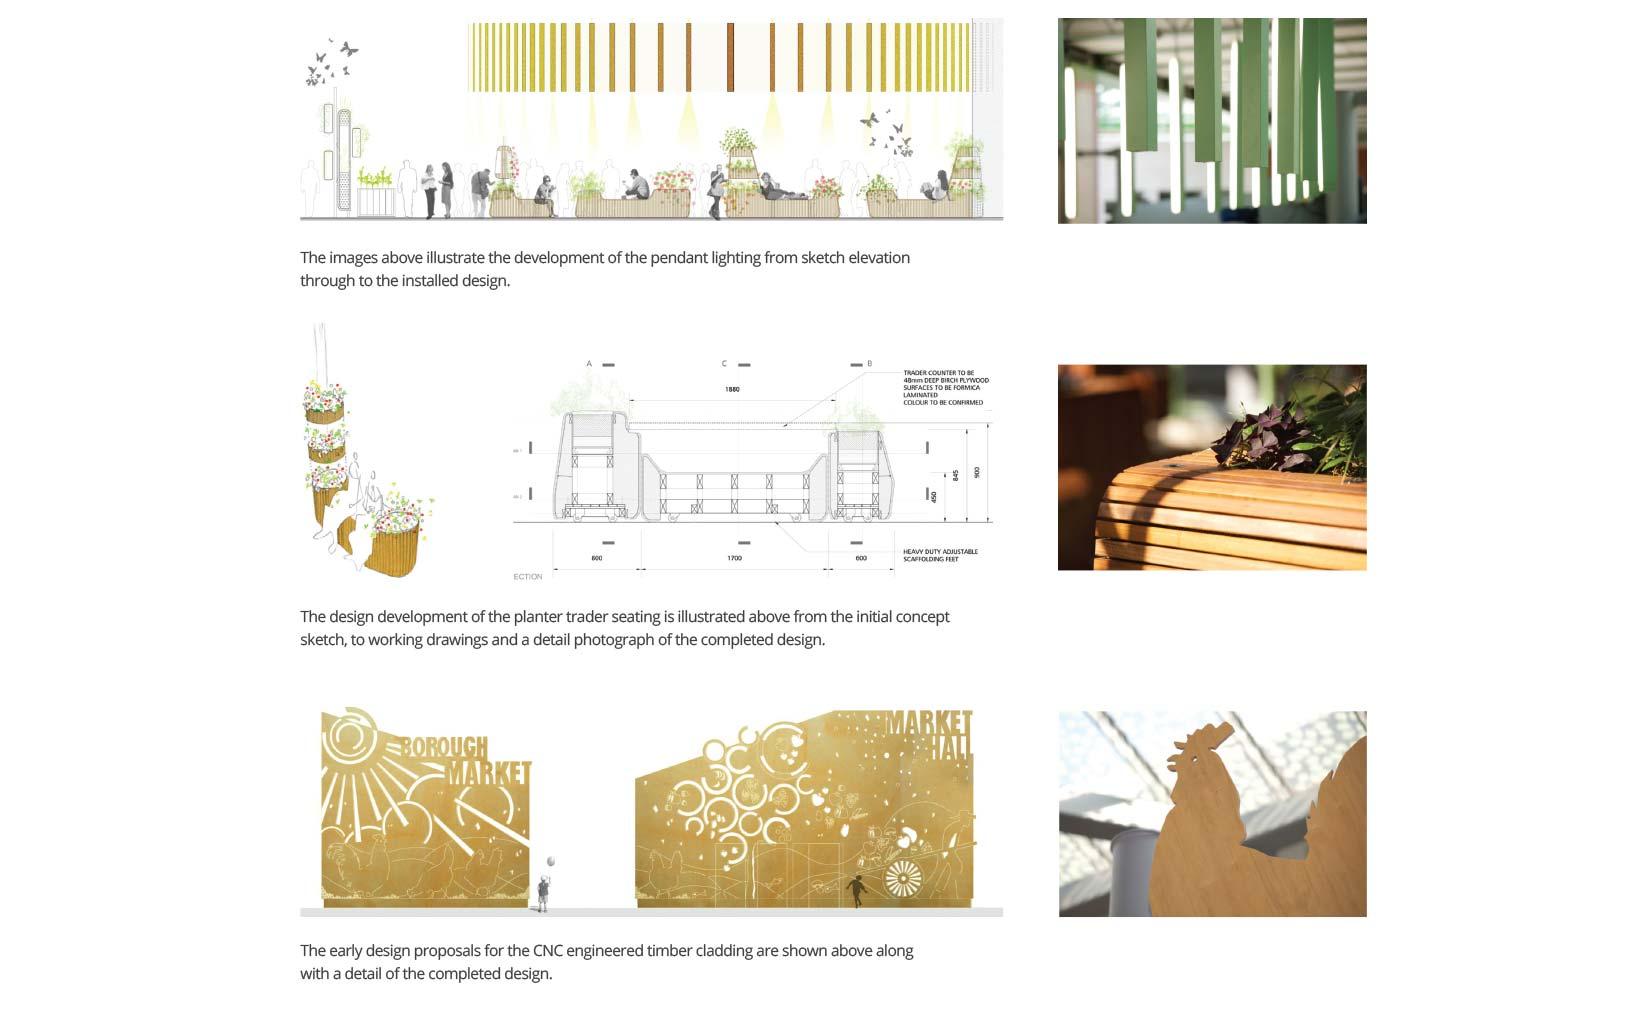 Borough Market, Programmatic & Design Development